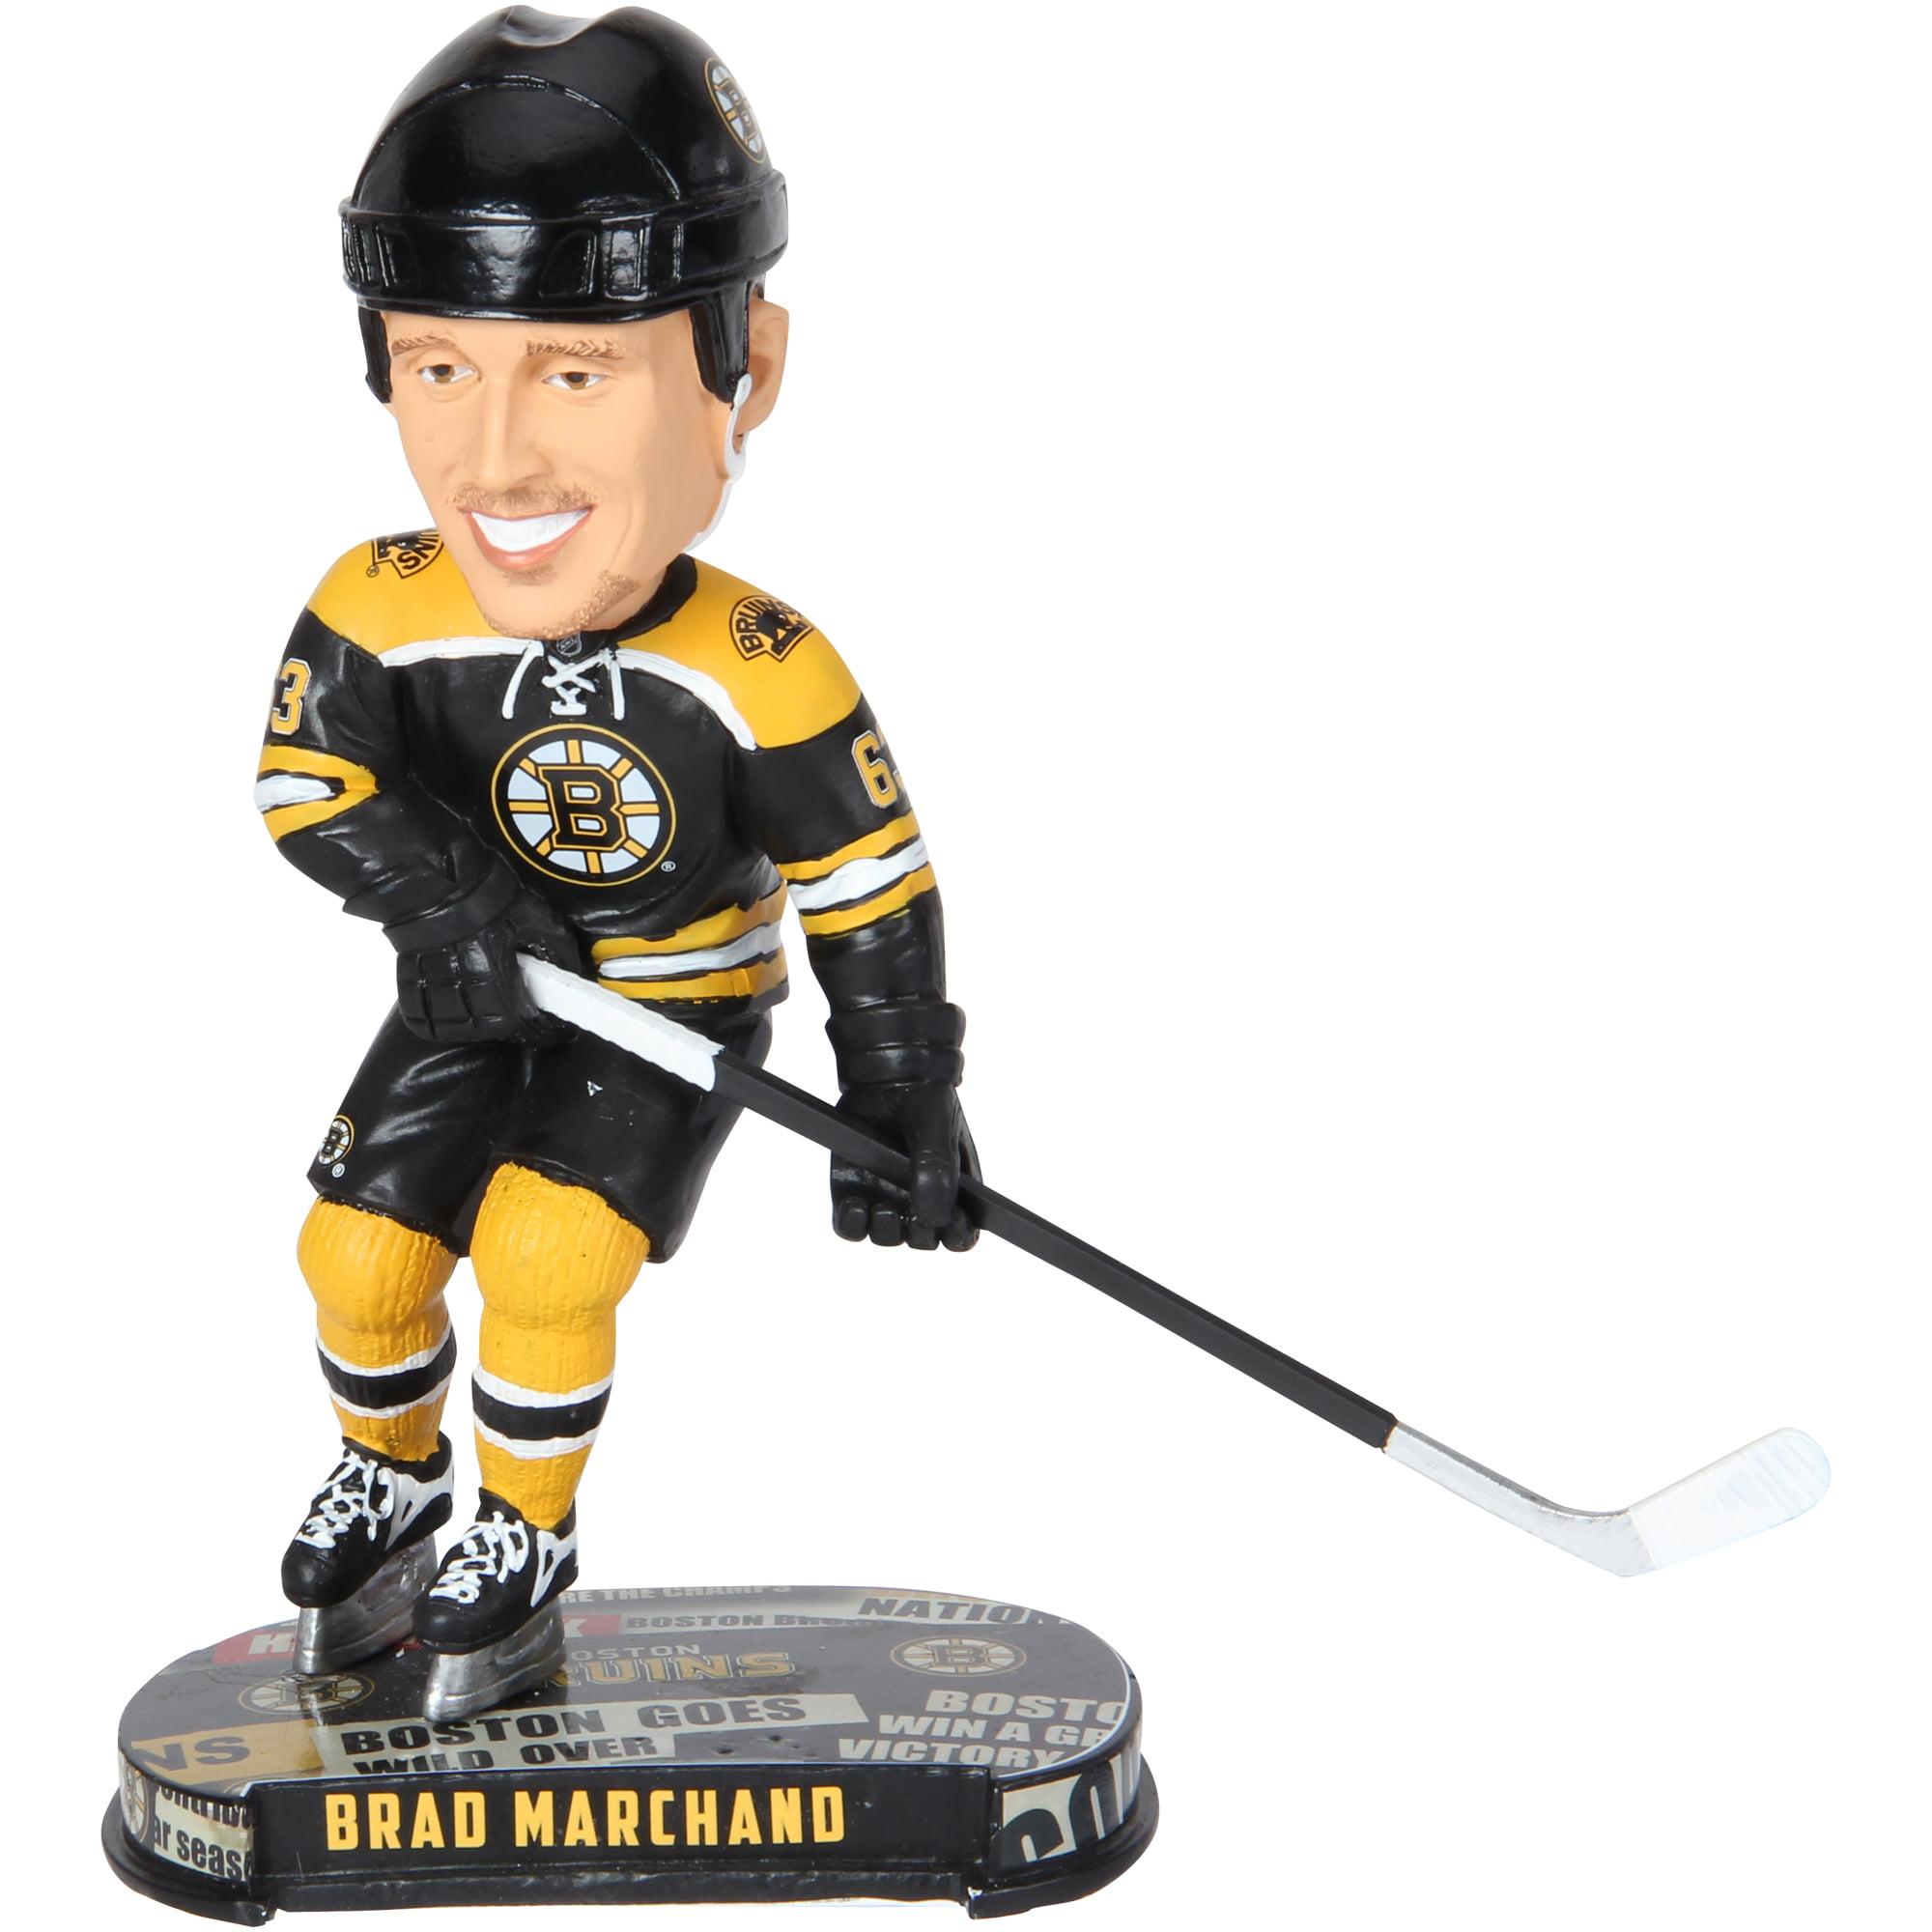 Brad Marchand Boston Bruins 2017 Headline Player Bobblehead - No Size